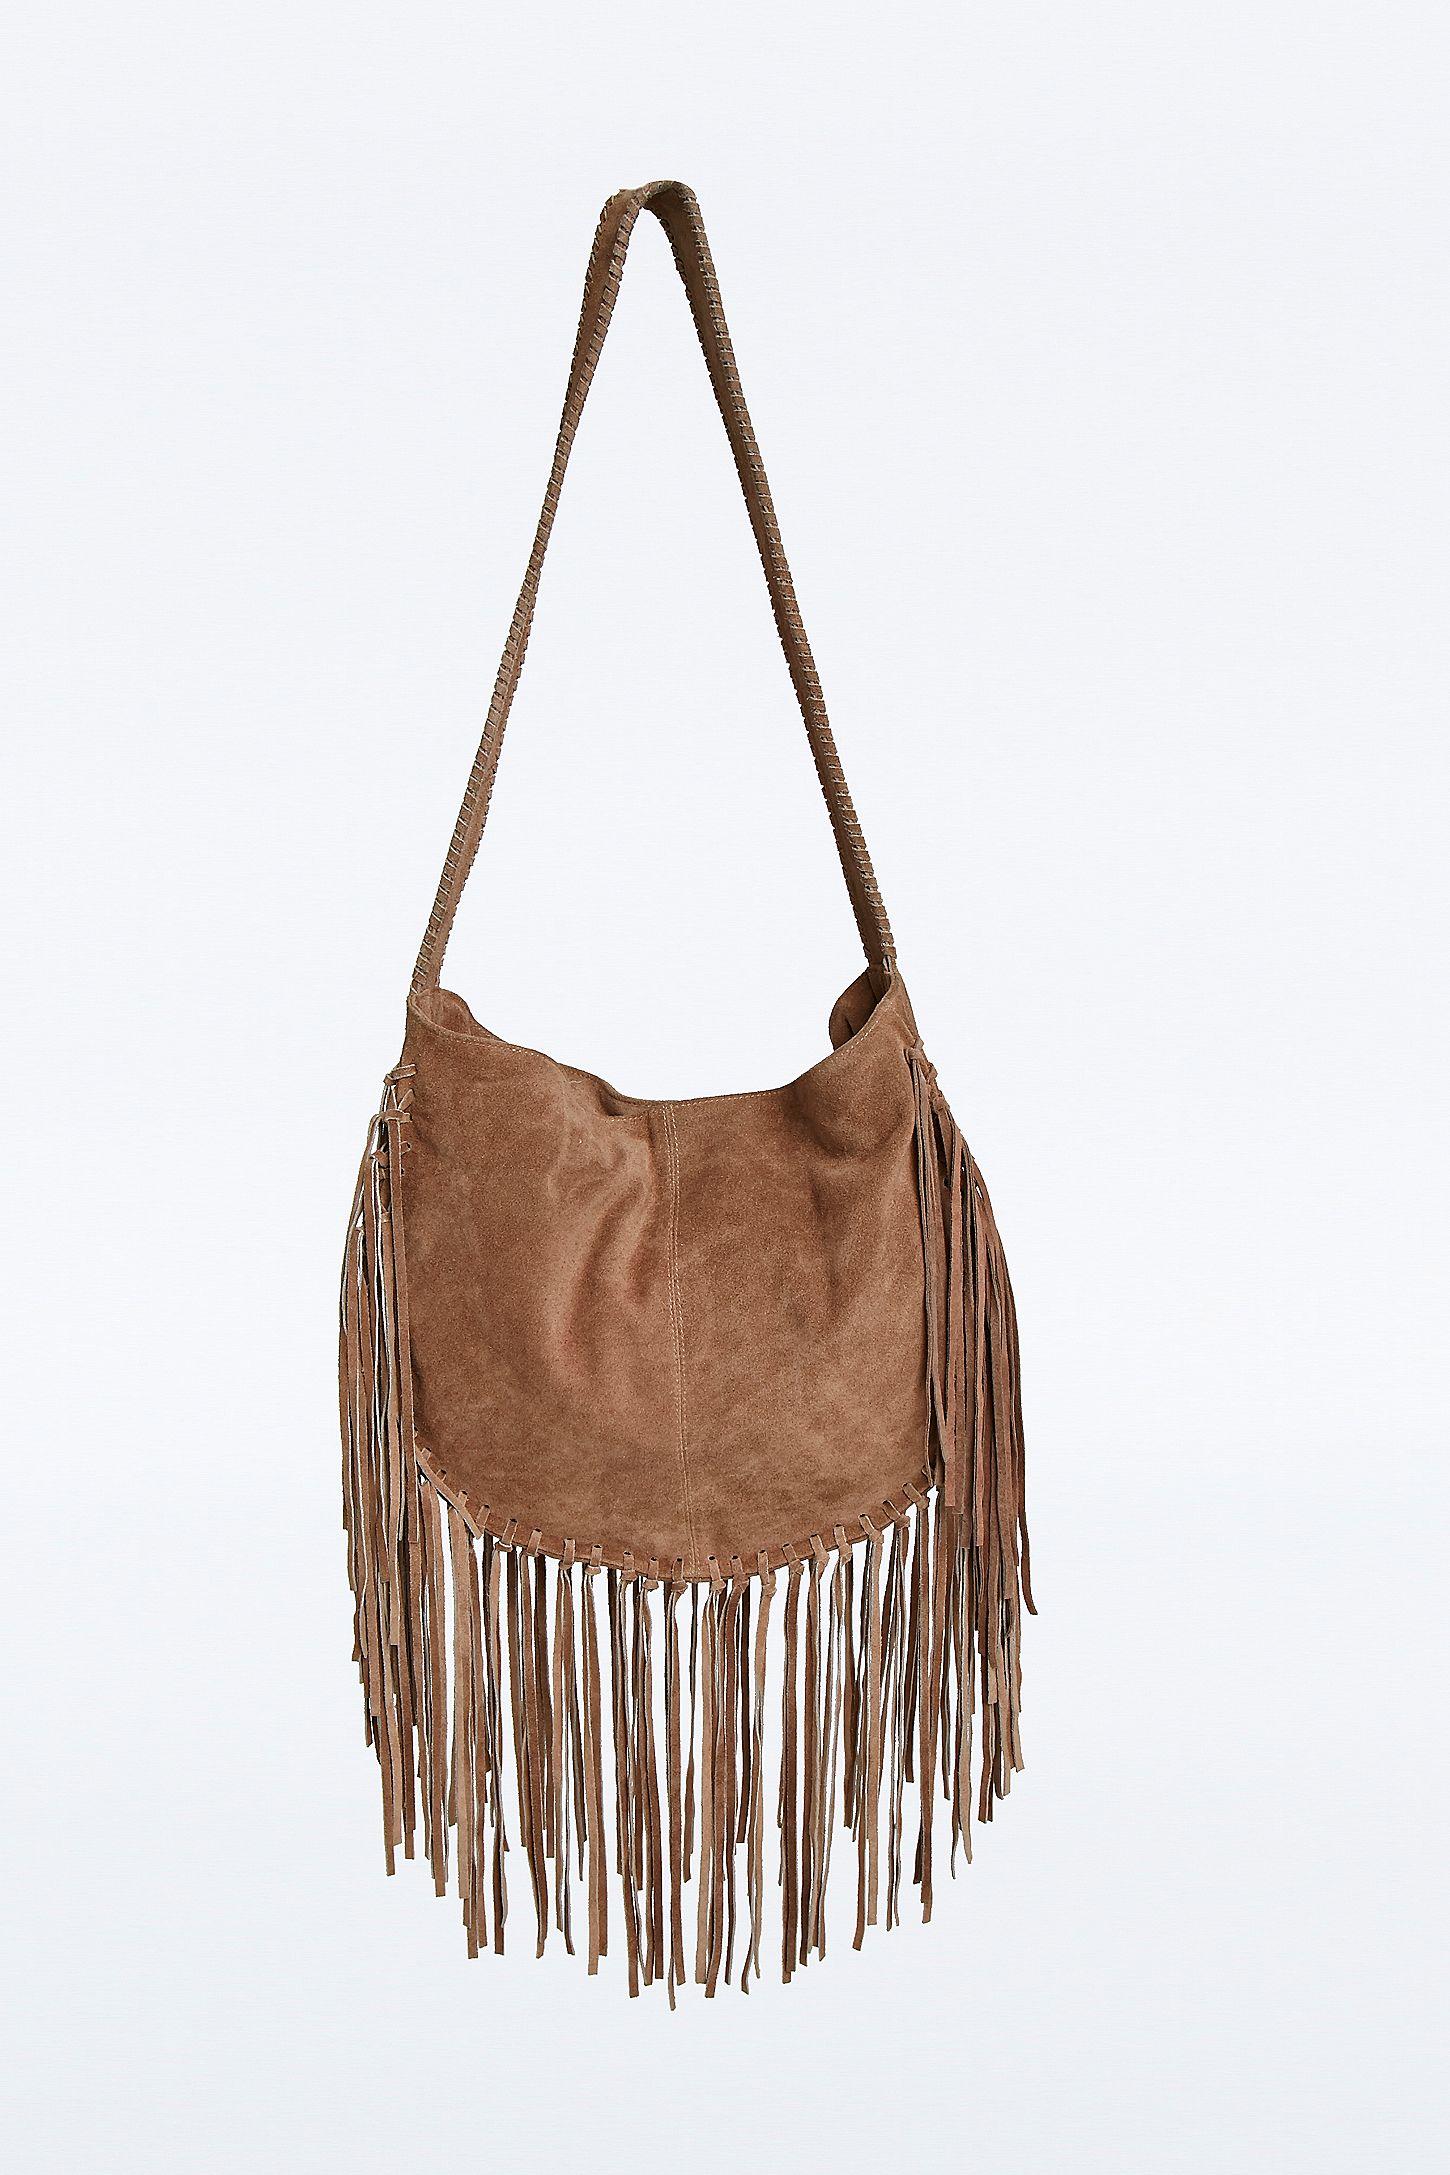 fa1b24ab Ecote Bettina Suede Fringe Boho Bag in Beige | Urban Outfitters UK